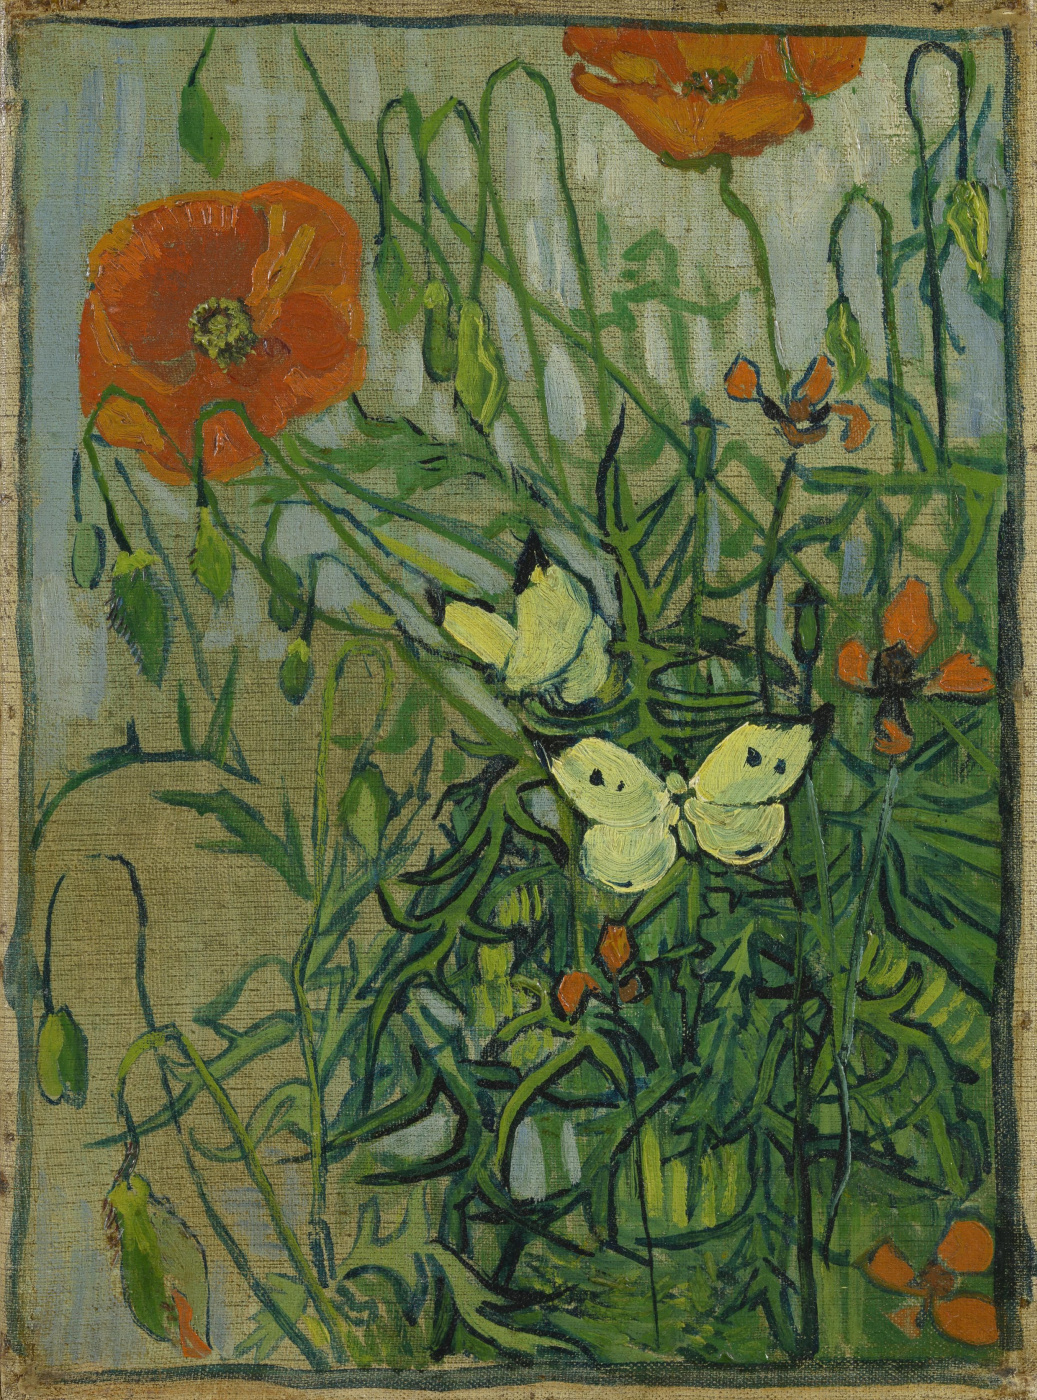 Vincent van Gogh. Poppies and butterflies